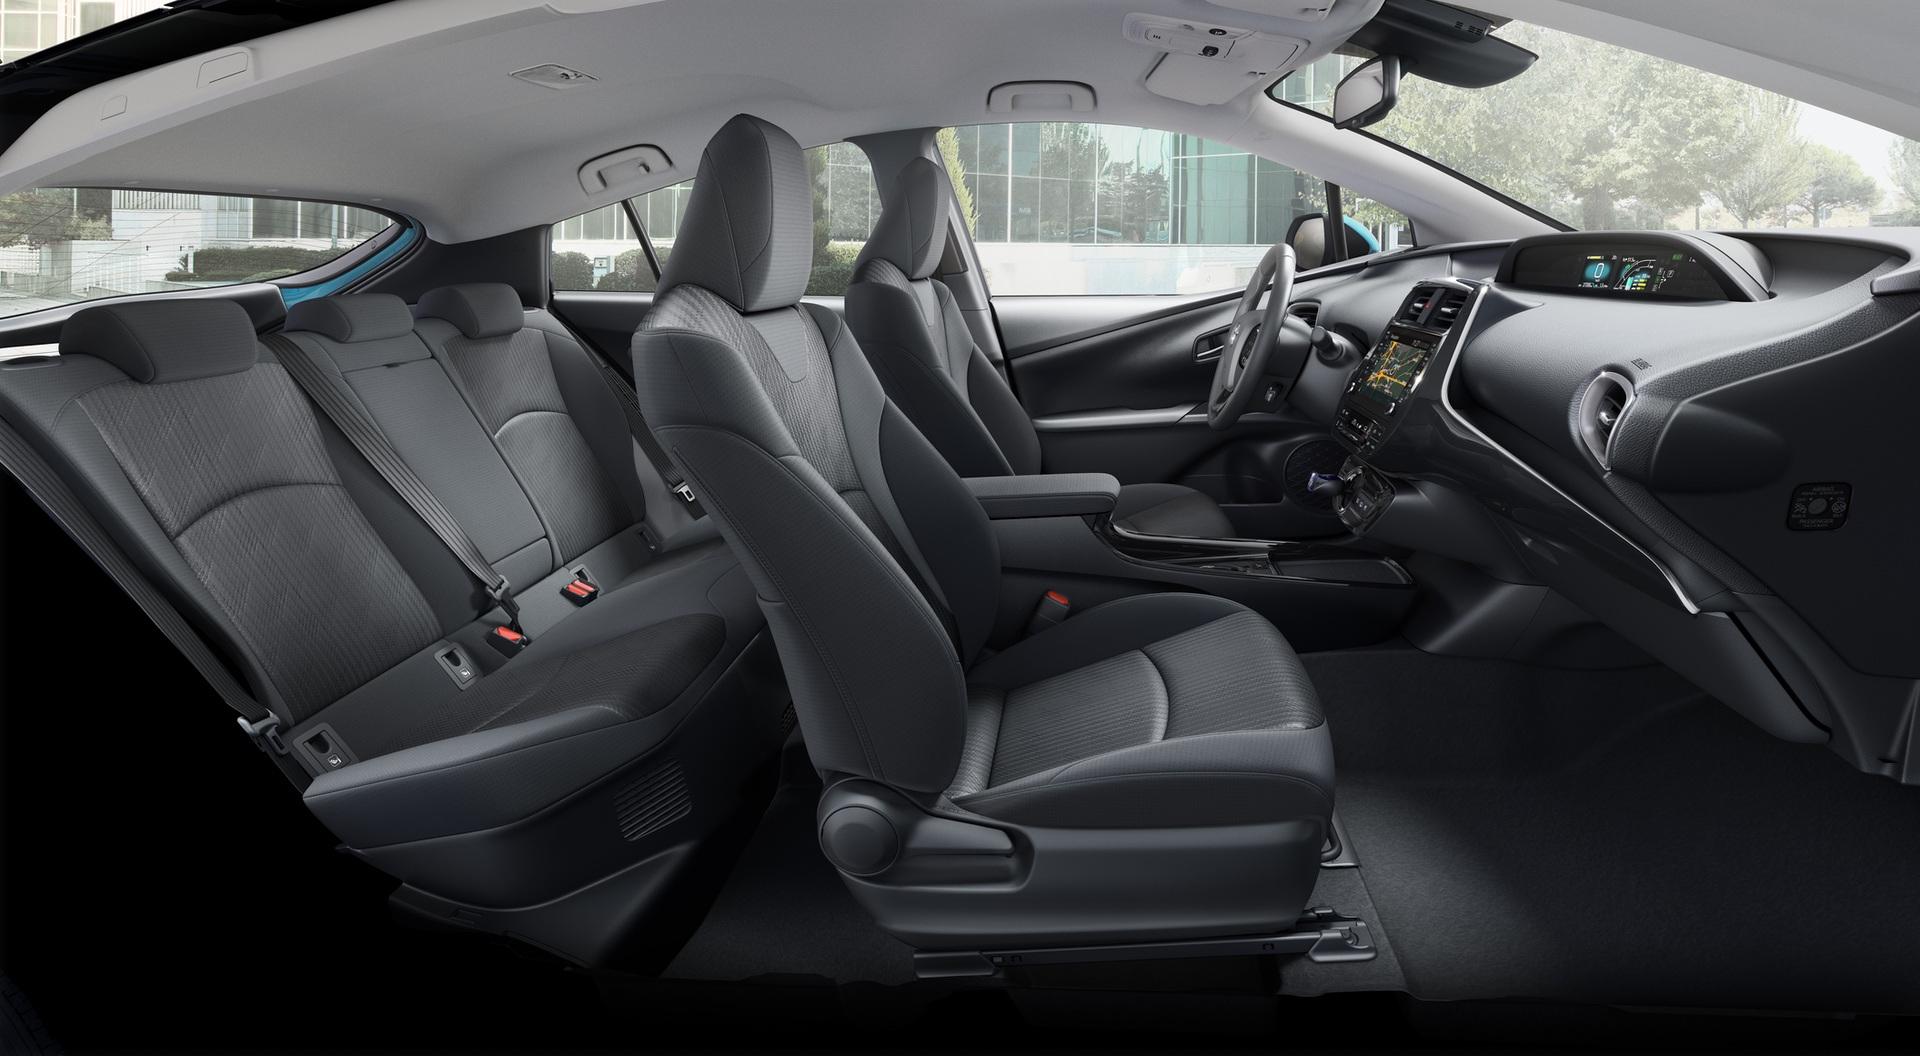 2019_Toyota_Prius_Plug-in_Hybrid_0002